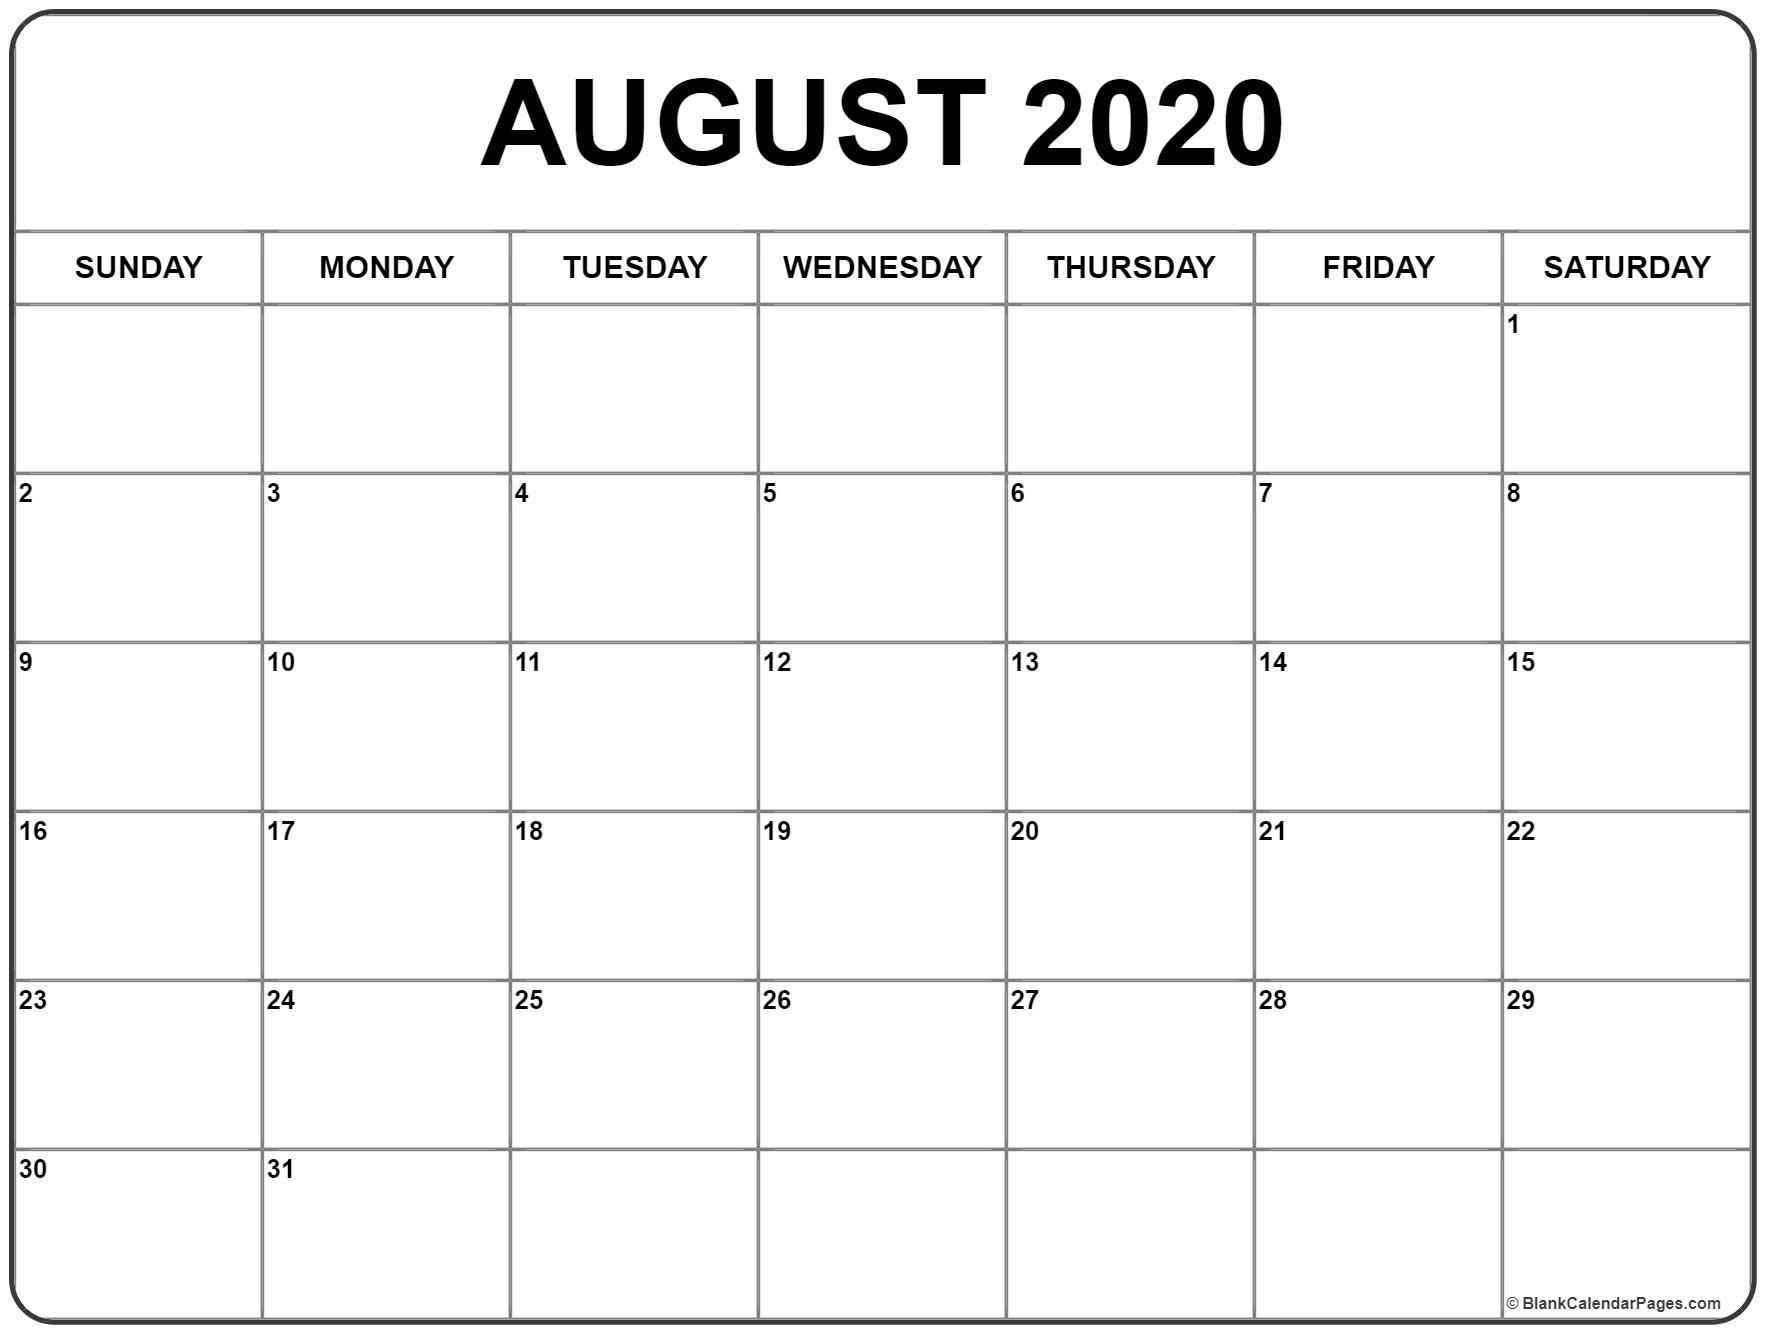 August 2020 Calendar | Free Printable Monthly Calendars_Monthly Calendar Blank 2020